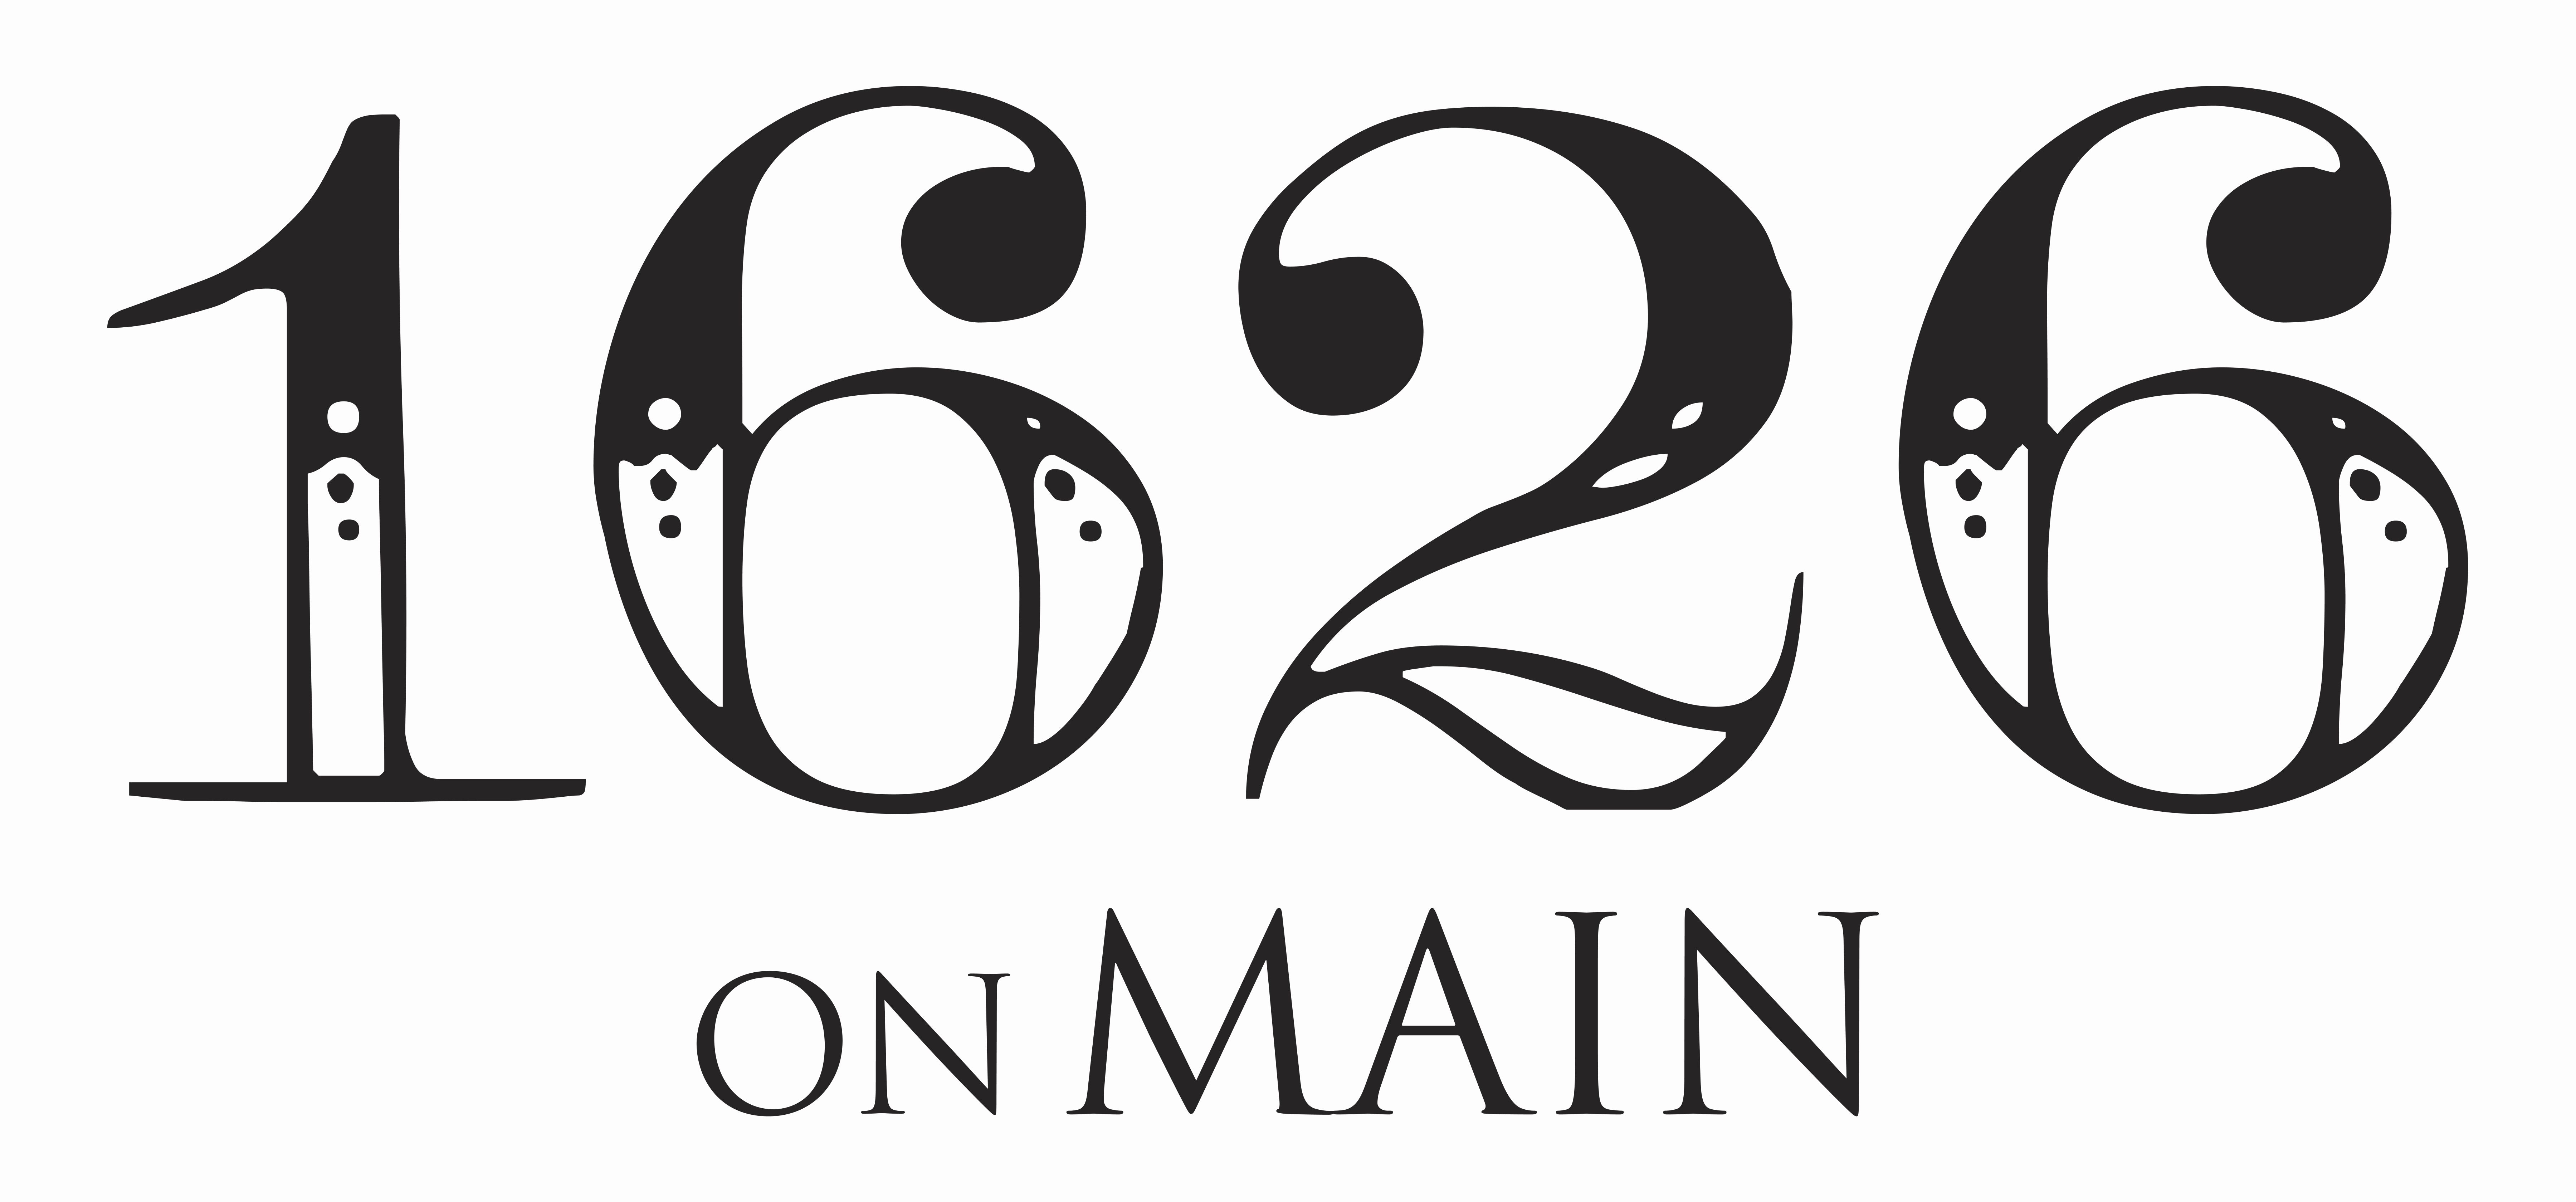 logo1626onmain.jpg